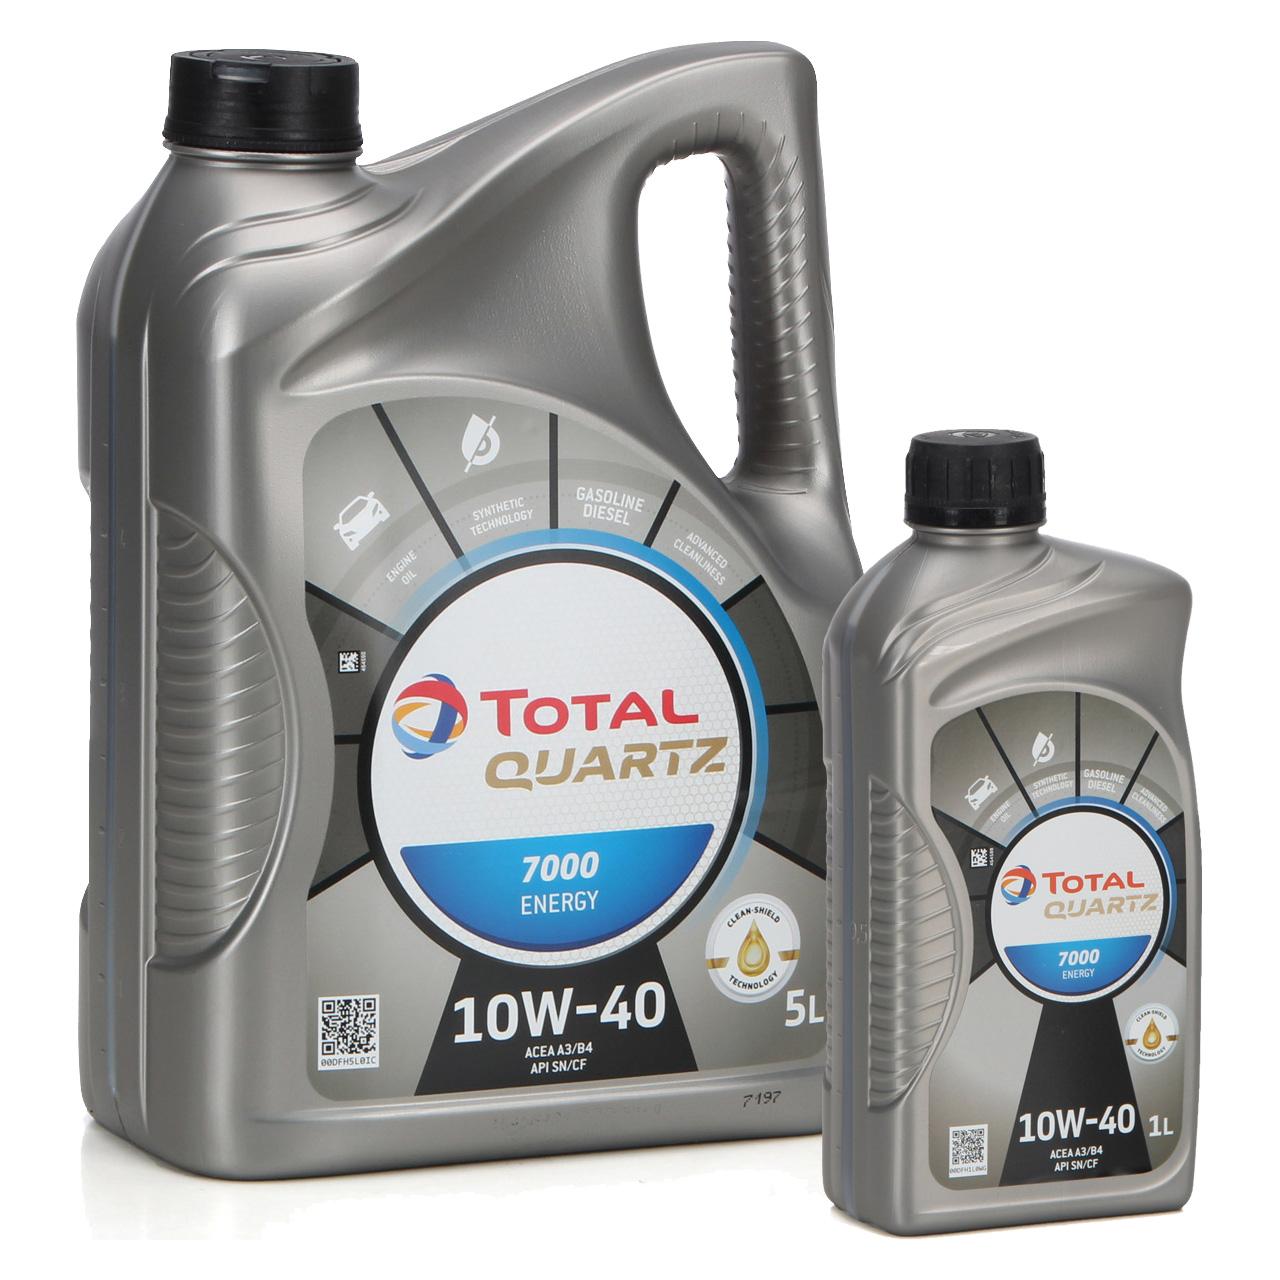 TOTAL QUARTZ 7000 ENERGY Motoröl Öl 10W-40 10W40 VW 501.01/505.00 - 6L 6 Liter